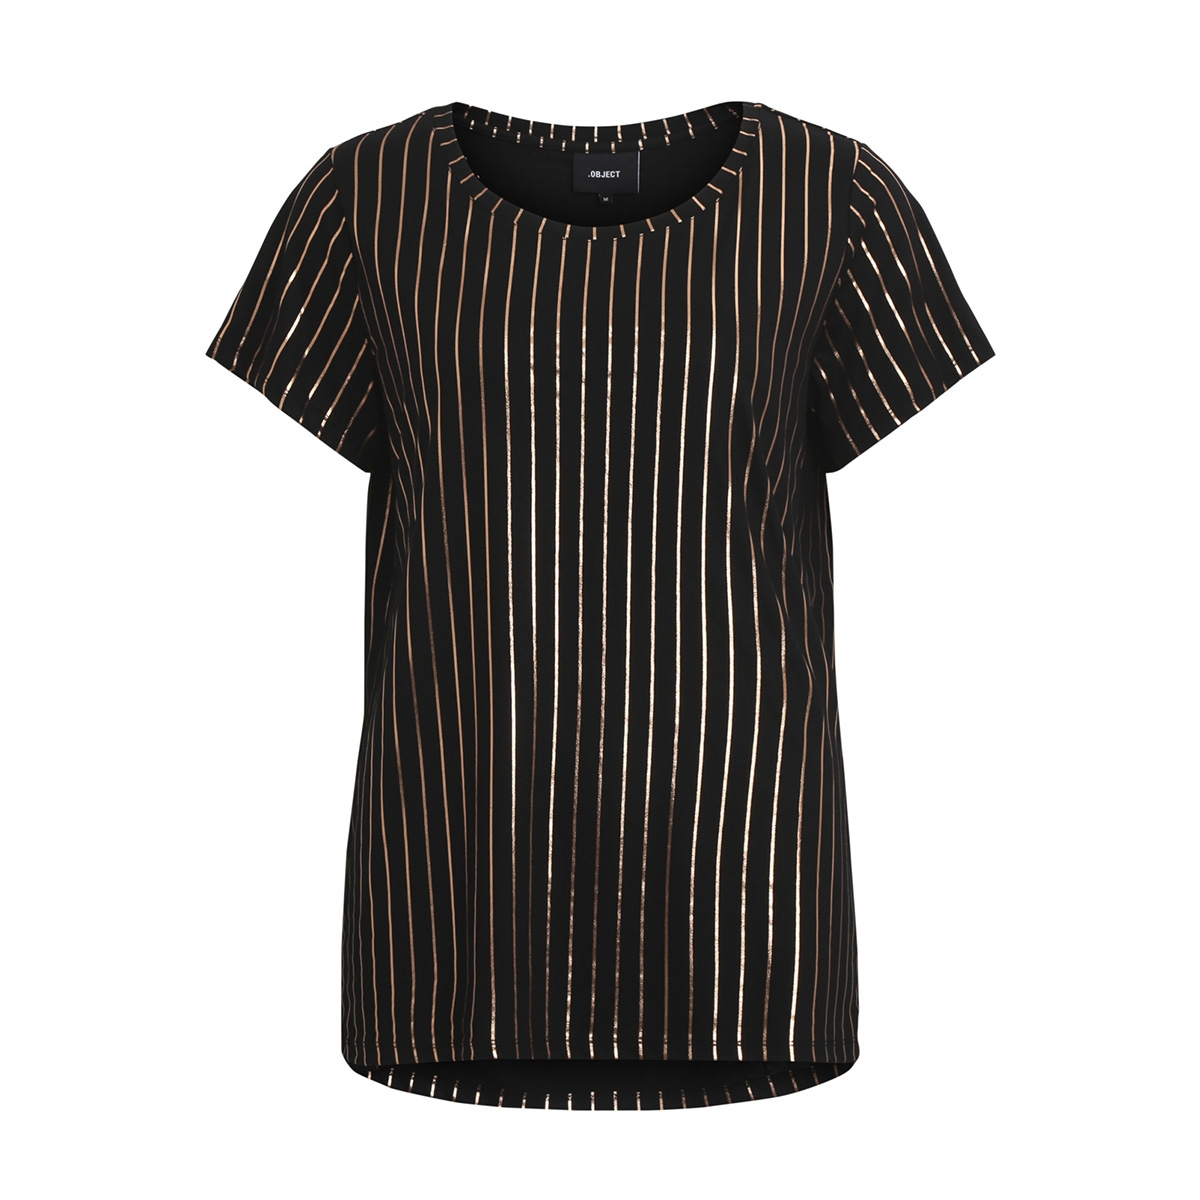 objsplash stripe s/s t-shirt a 23026954 object t-shirt black/gold foil